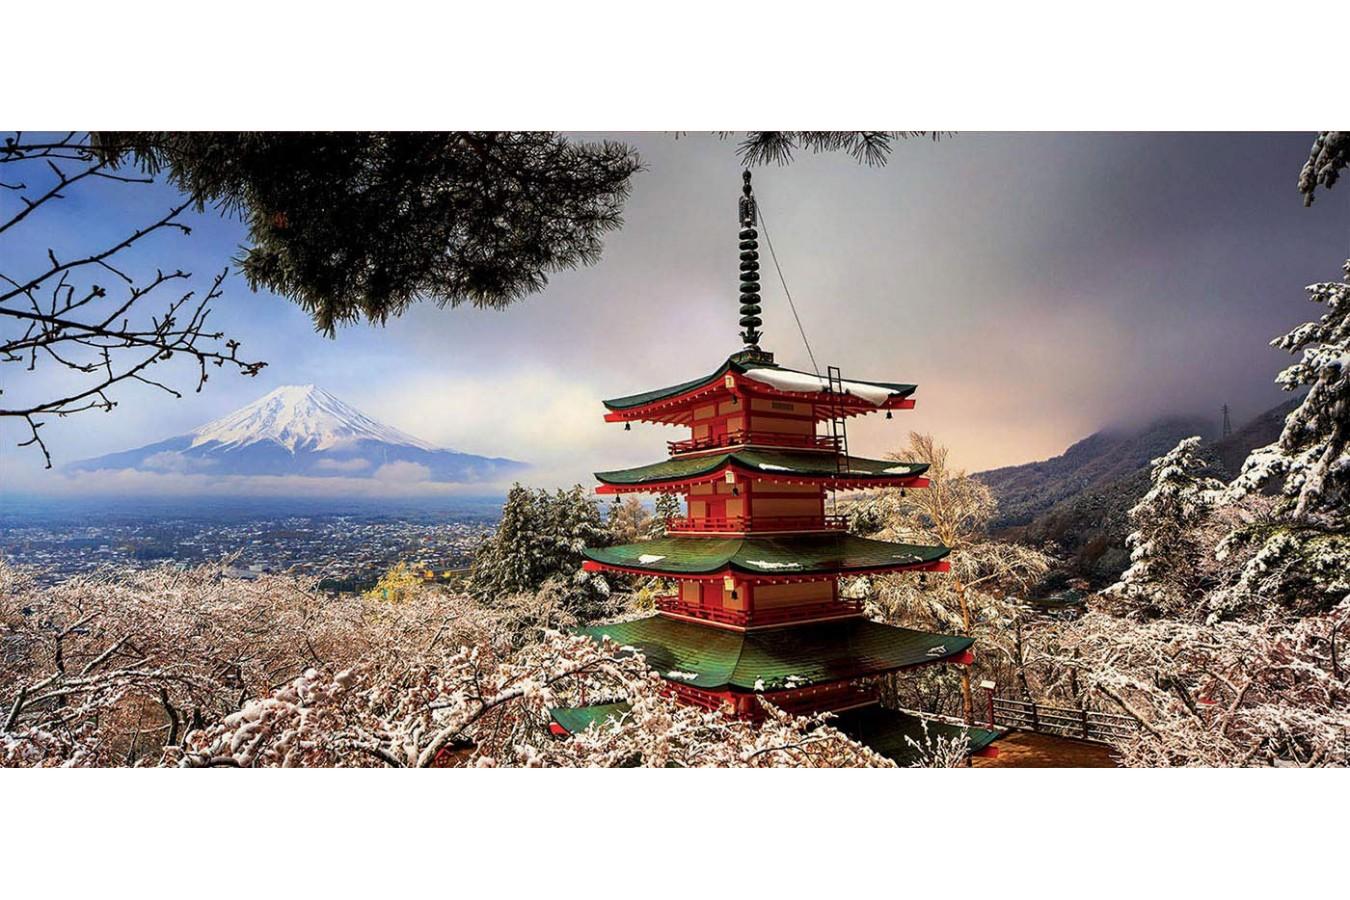 Puzzle panoramic Educa - Mount Fuji and Pagoda Chureito, Japan, 3.000 piese, include lipici (18013)